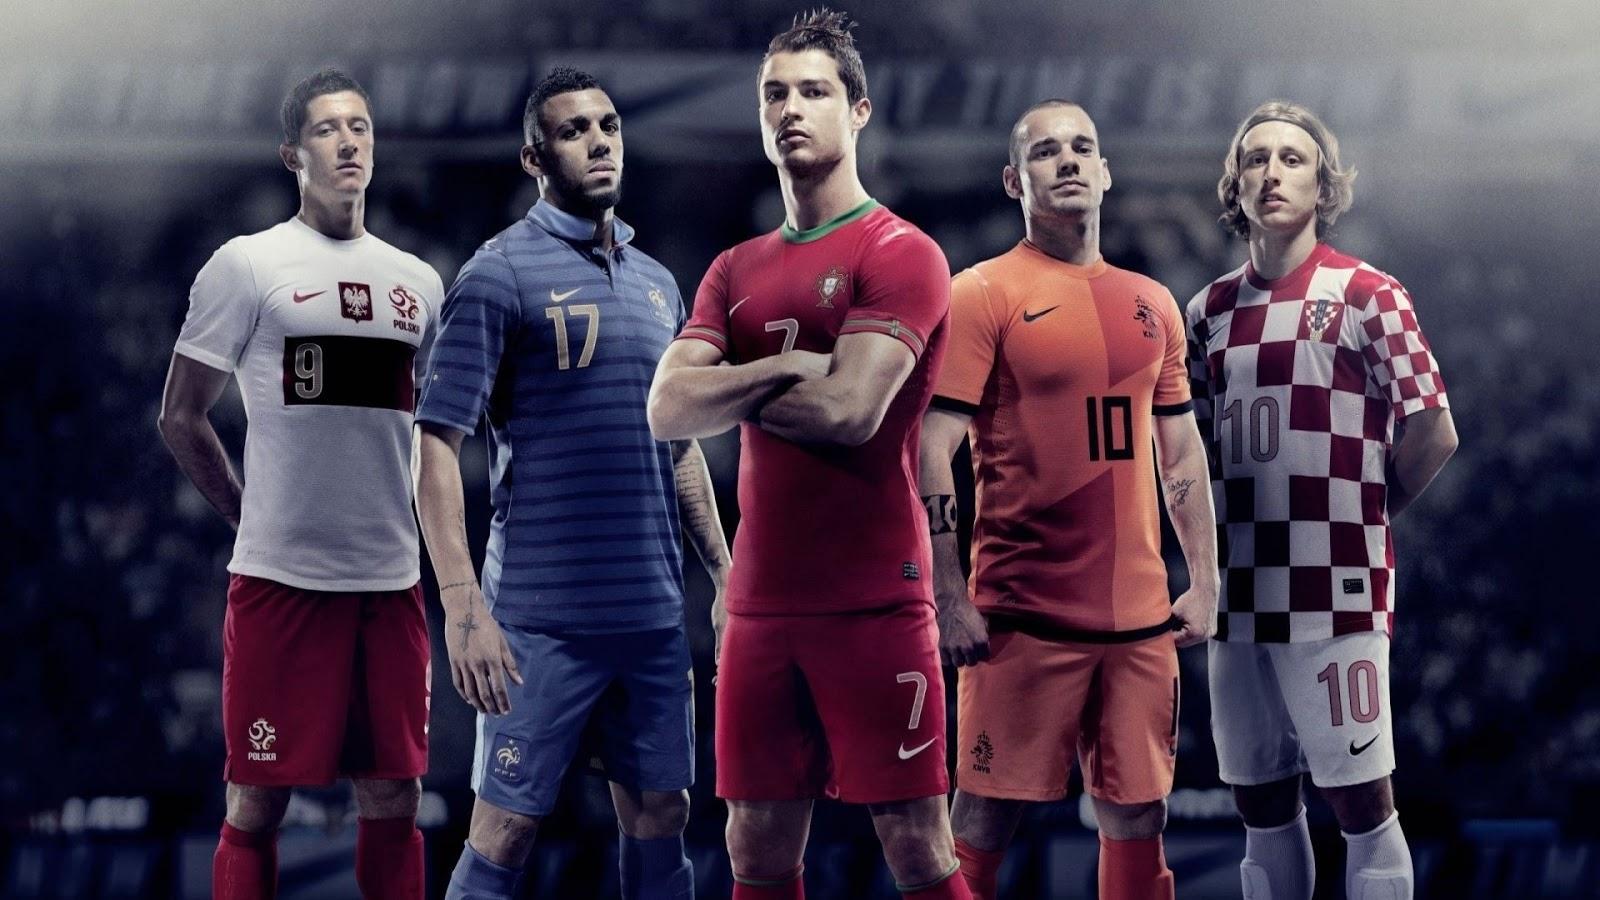 wesley+sneijder+galatasaray+resimleri+rooteto+21 Wesley Sneijder Galatasaray HD Resimleri